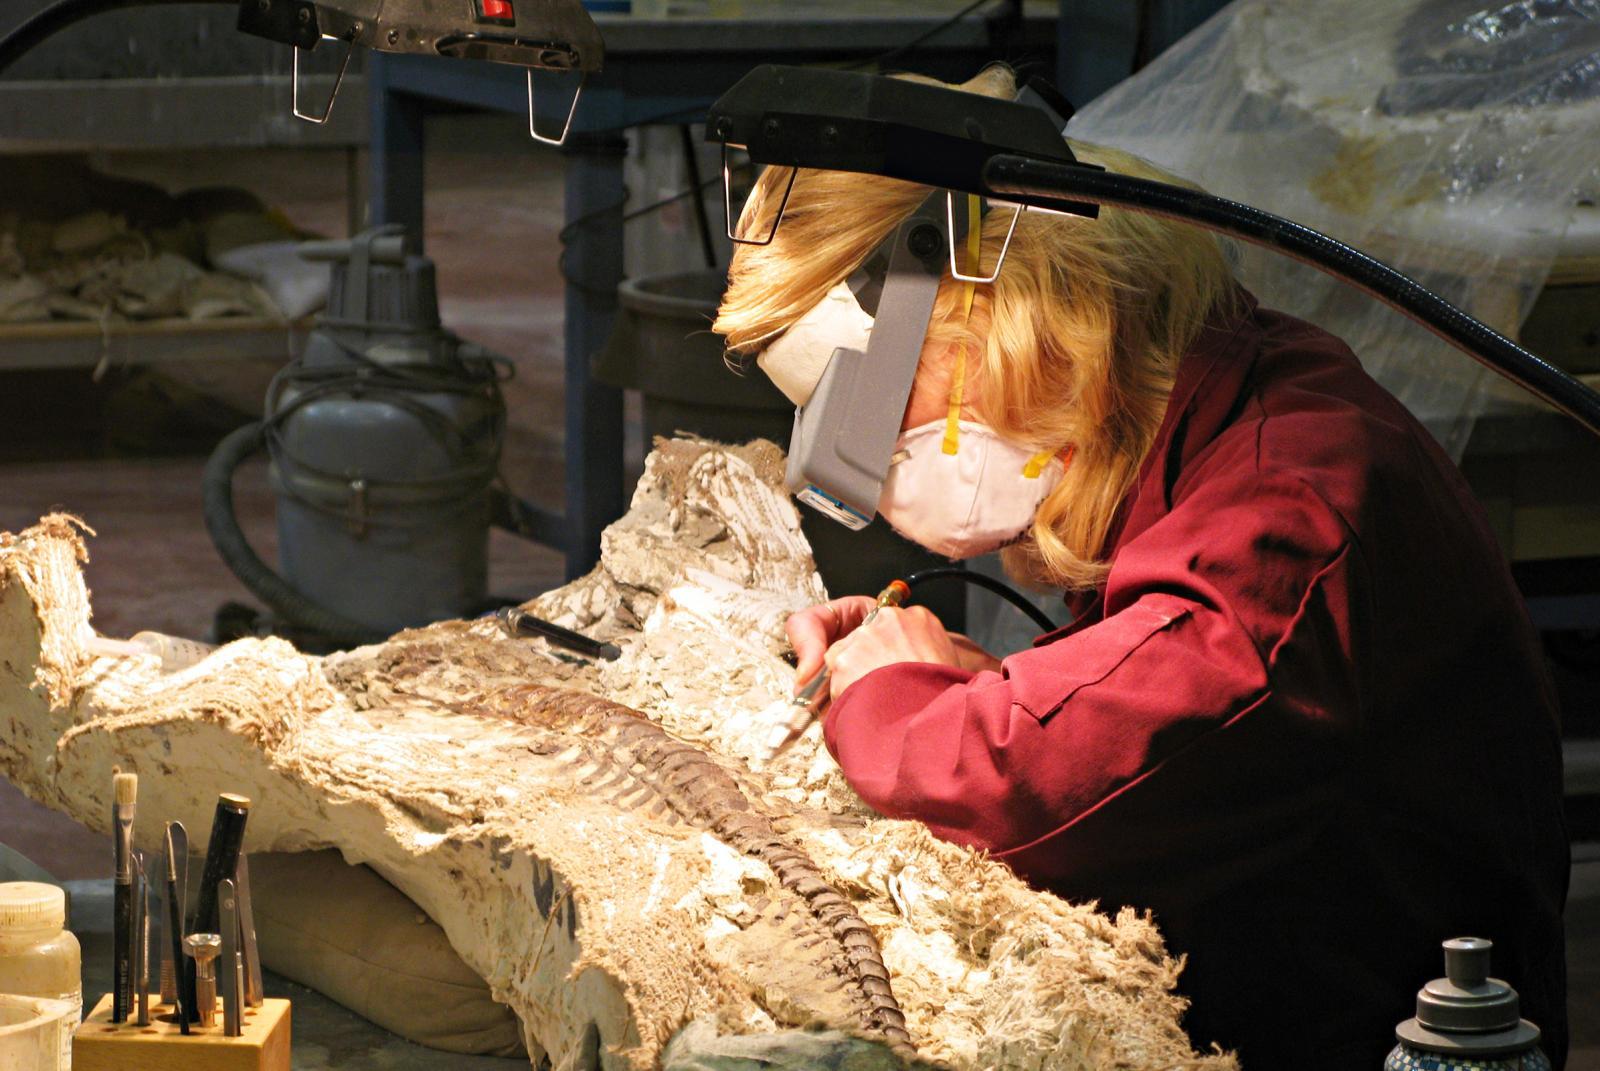 Paleontologist Working on Dinosaur Fossil